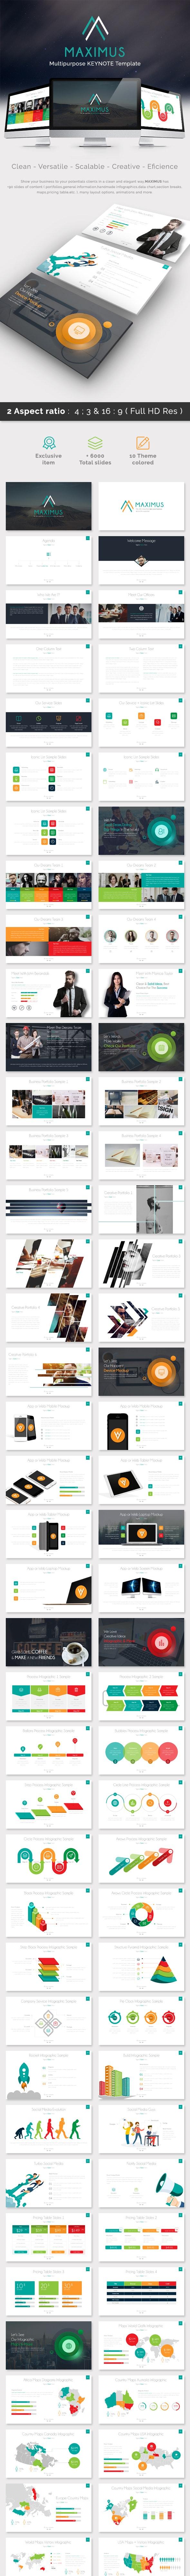 MAXIMUS - Keynote Multipurpose Presentation Template - Business Keynote Templates